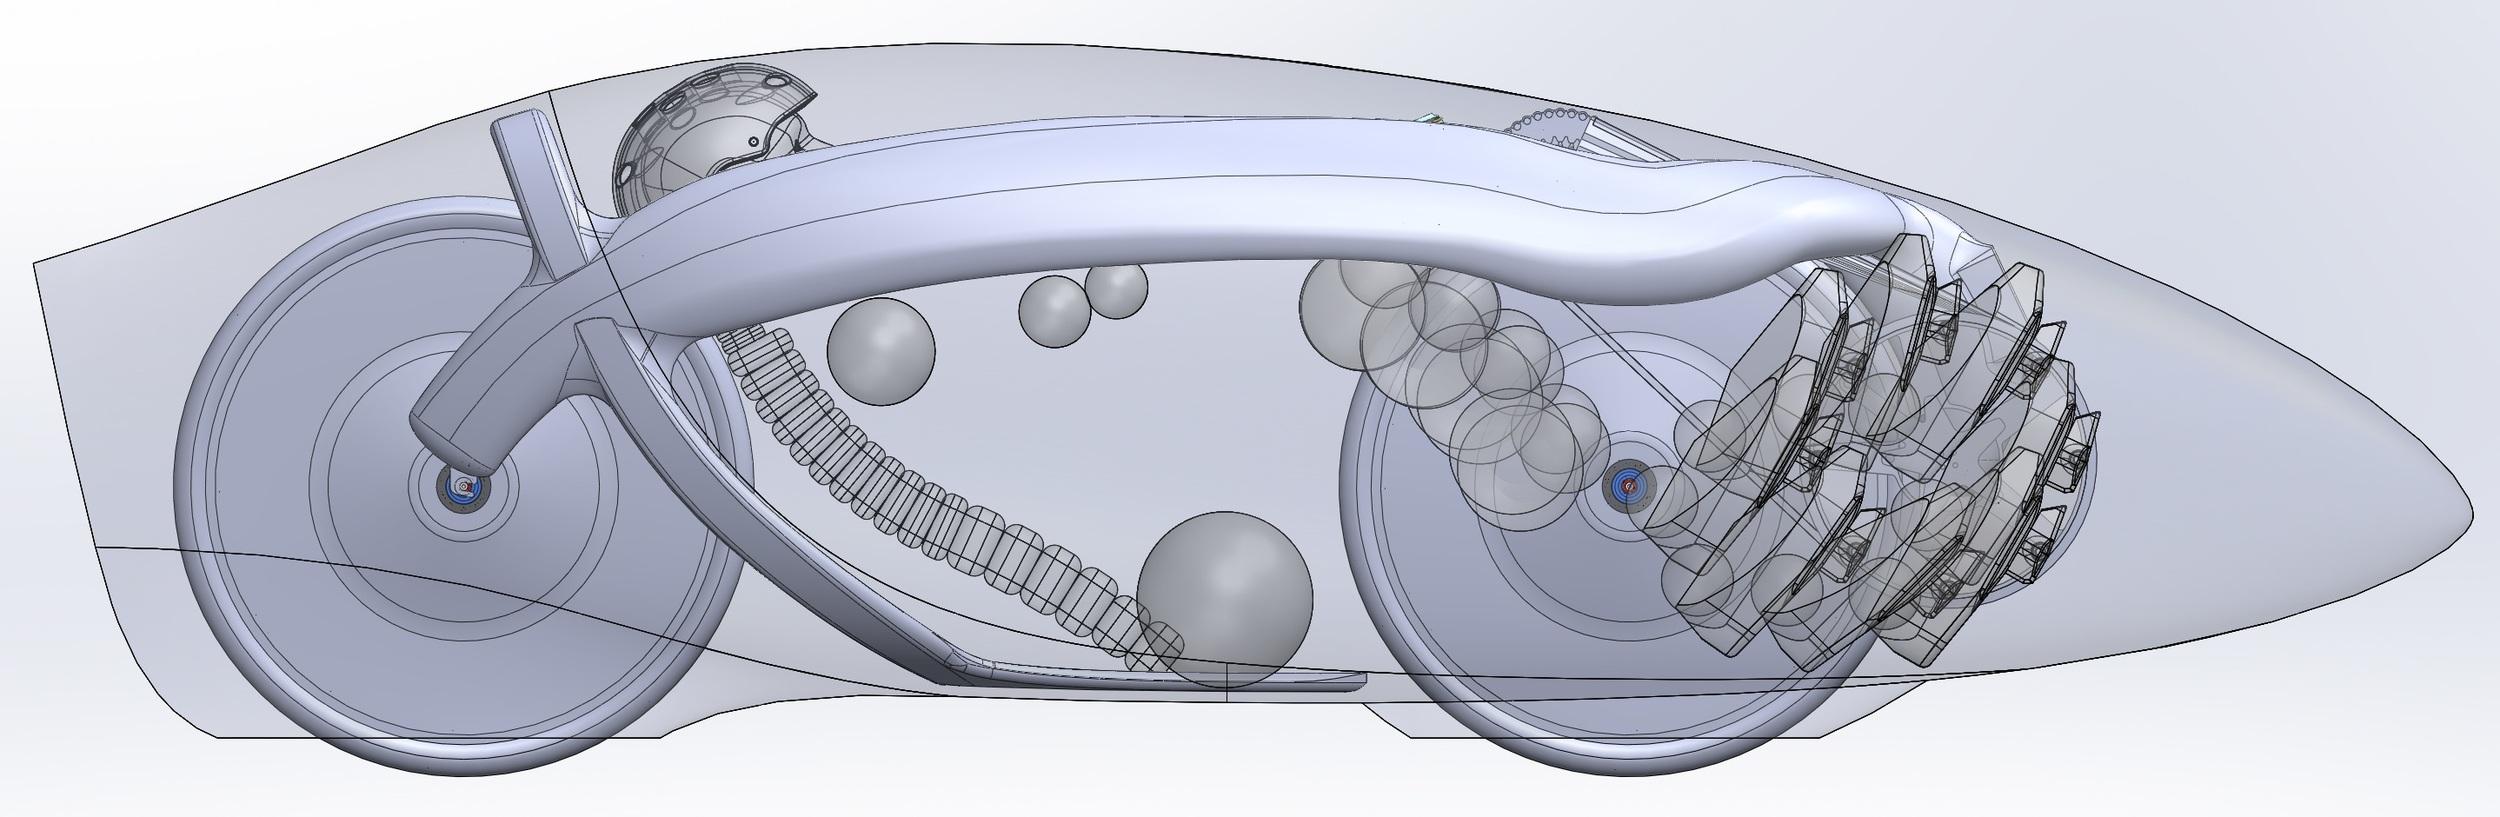 Side view of the final shape of Eta.